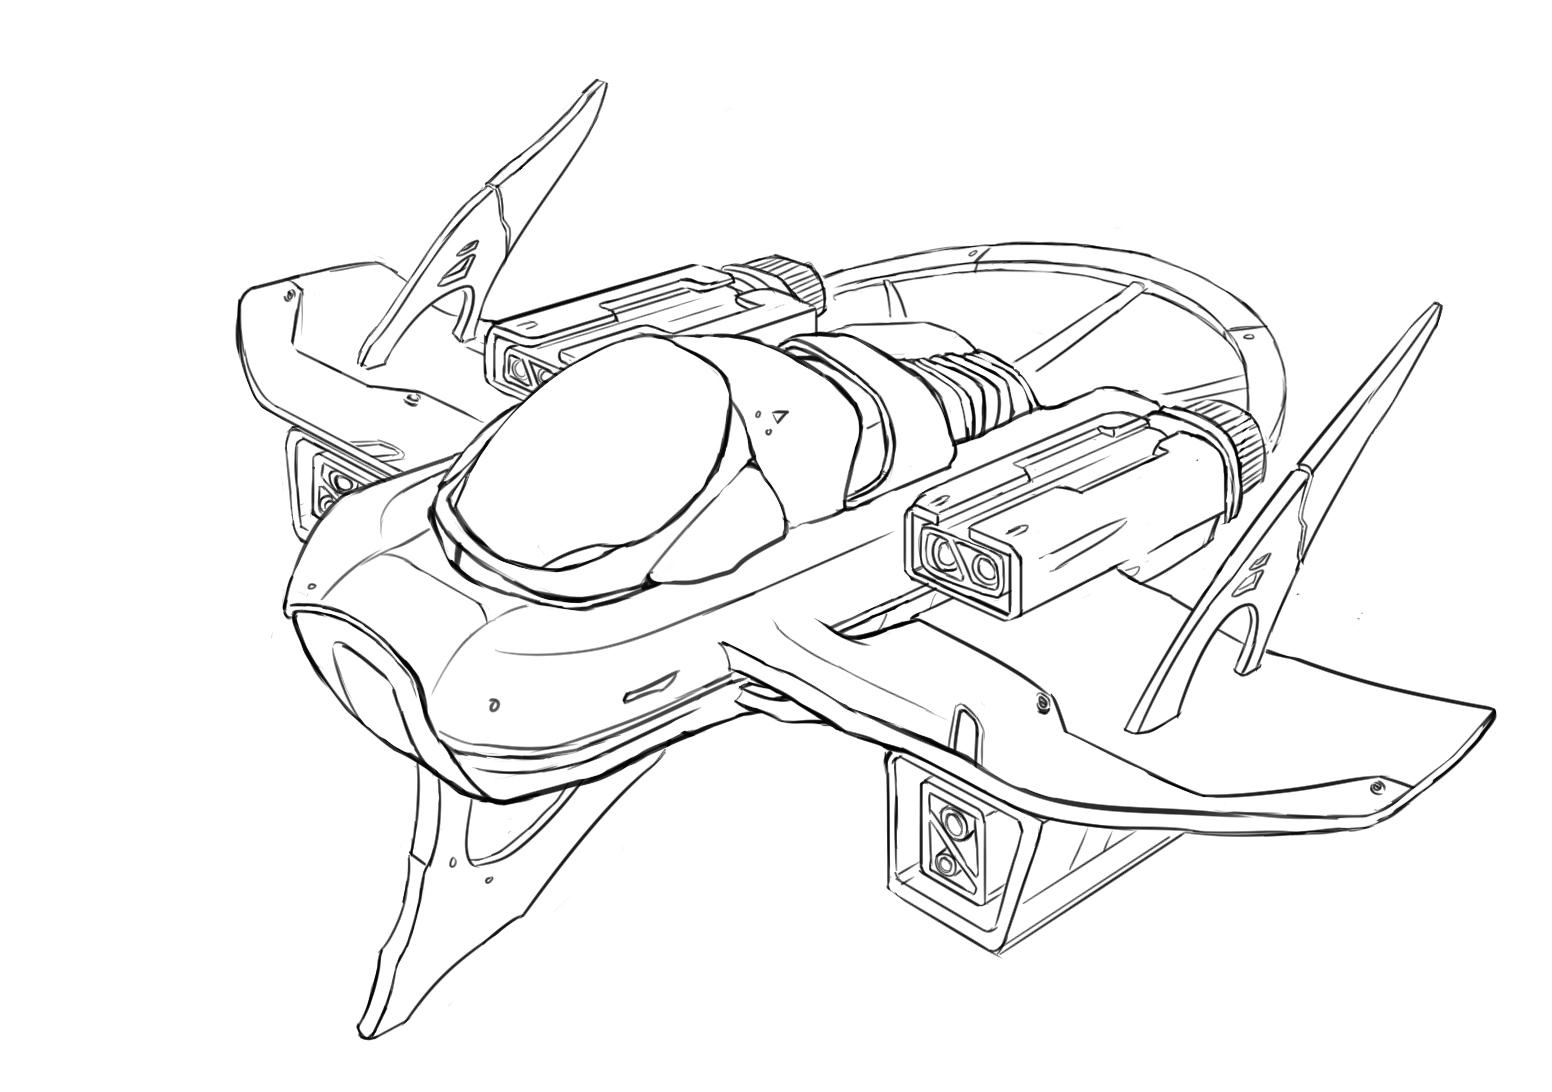 Space Ship fiona.jpg